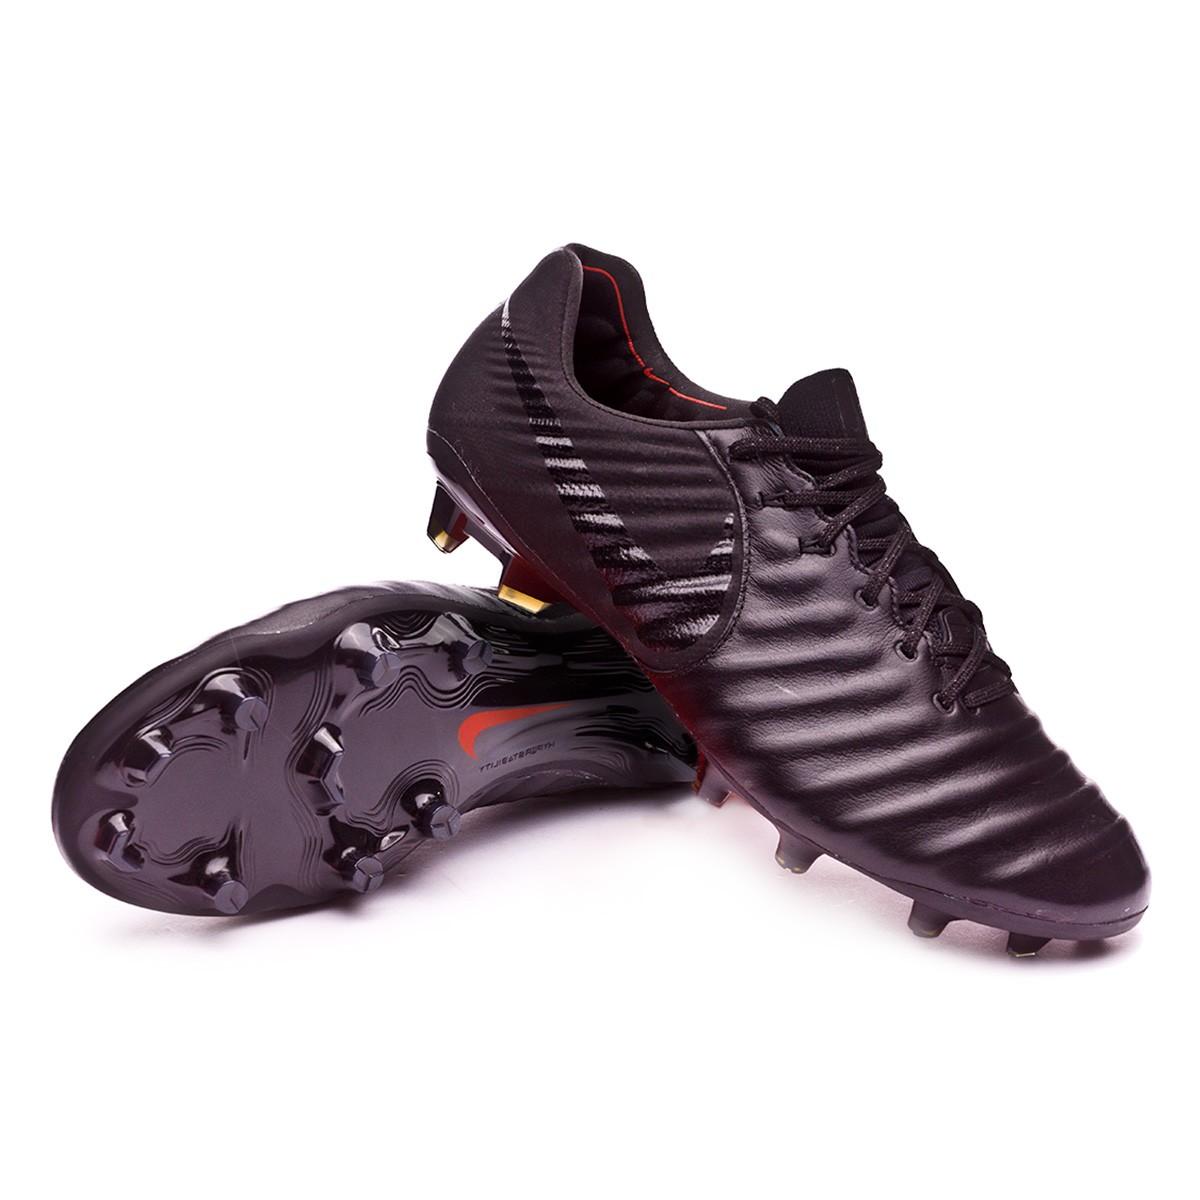 2c7961966 sale hot sale online nike tiempo 2014 legend elite turf soccer boots grey  orange black 41524 90d3f  promo code nike tiempo legend elite series 305c8  9097c